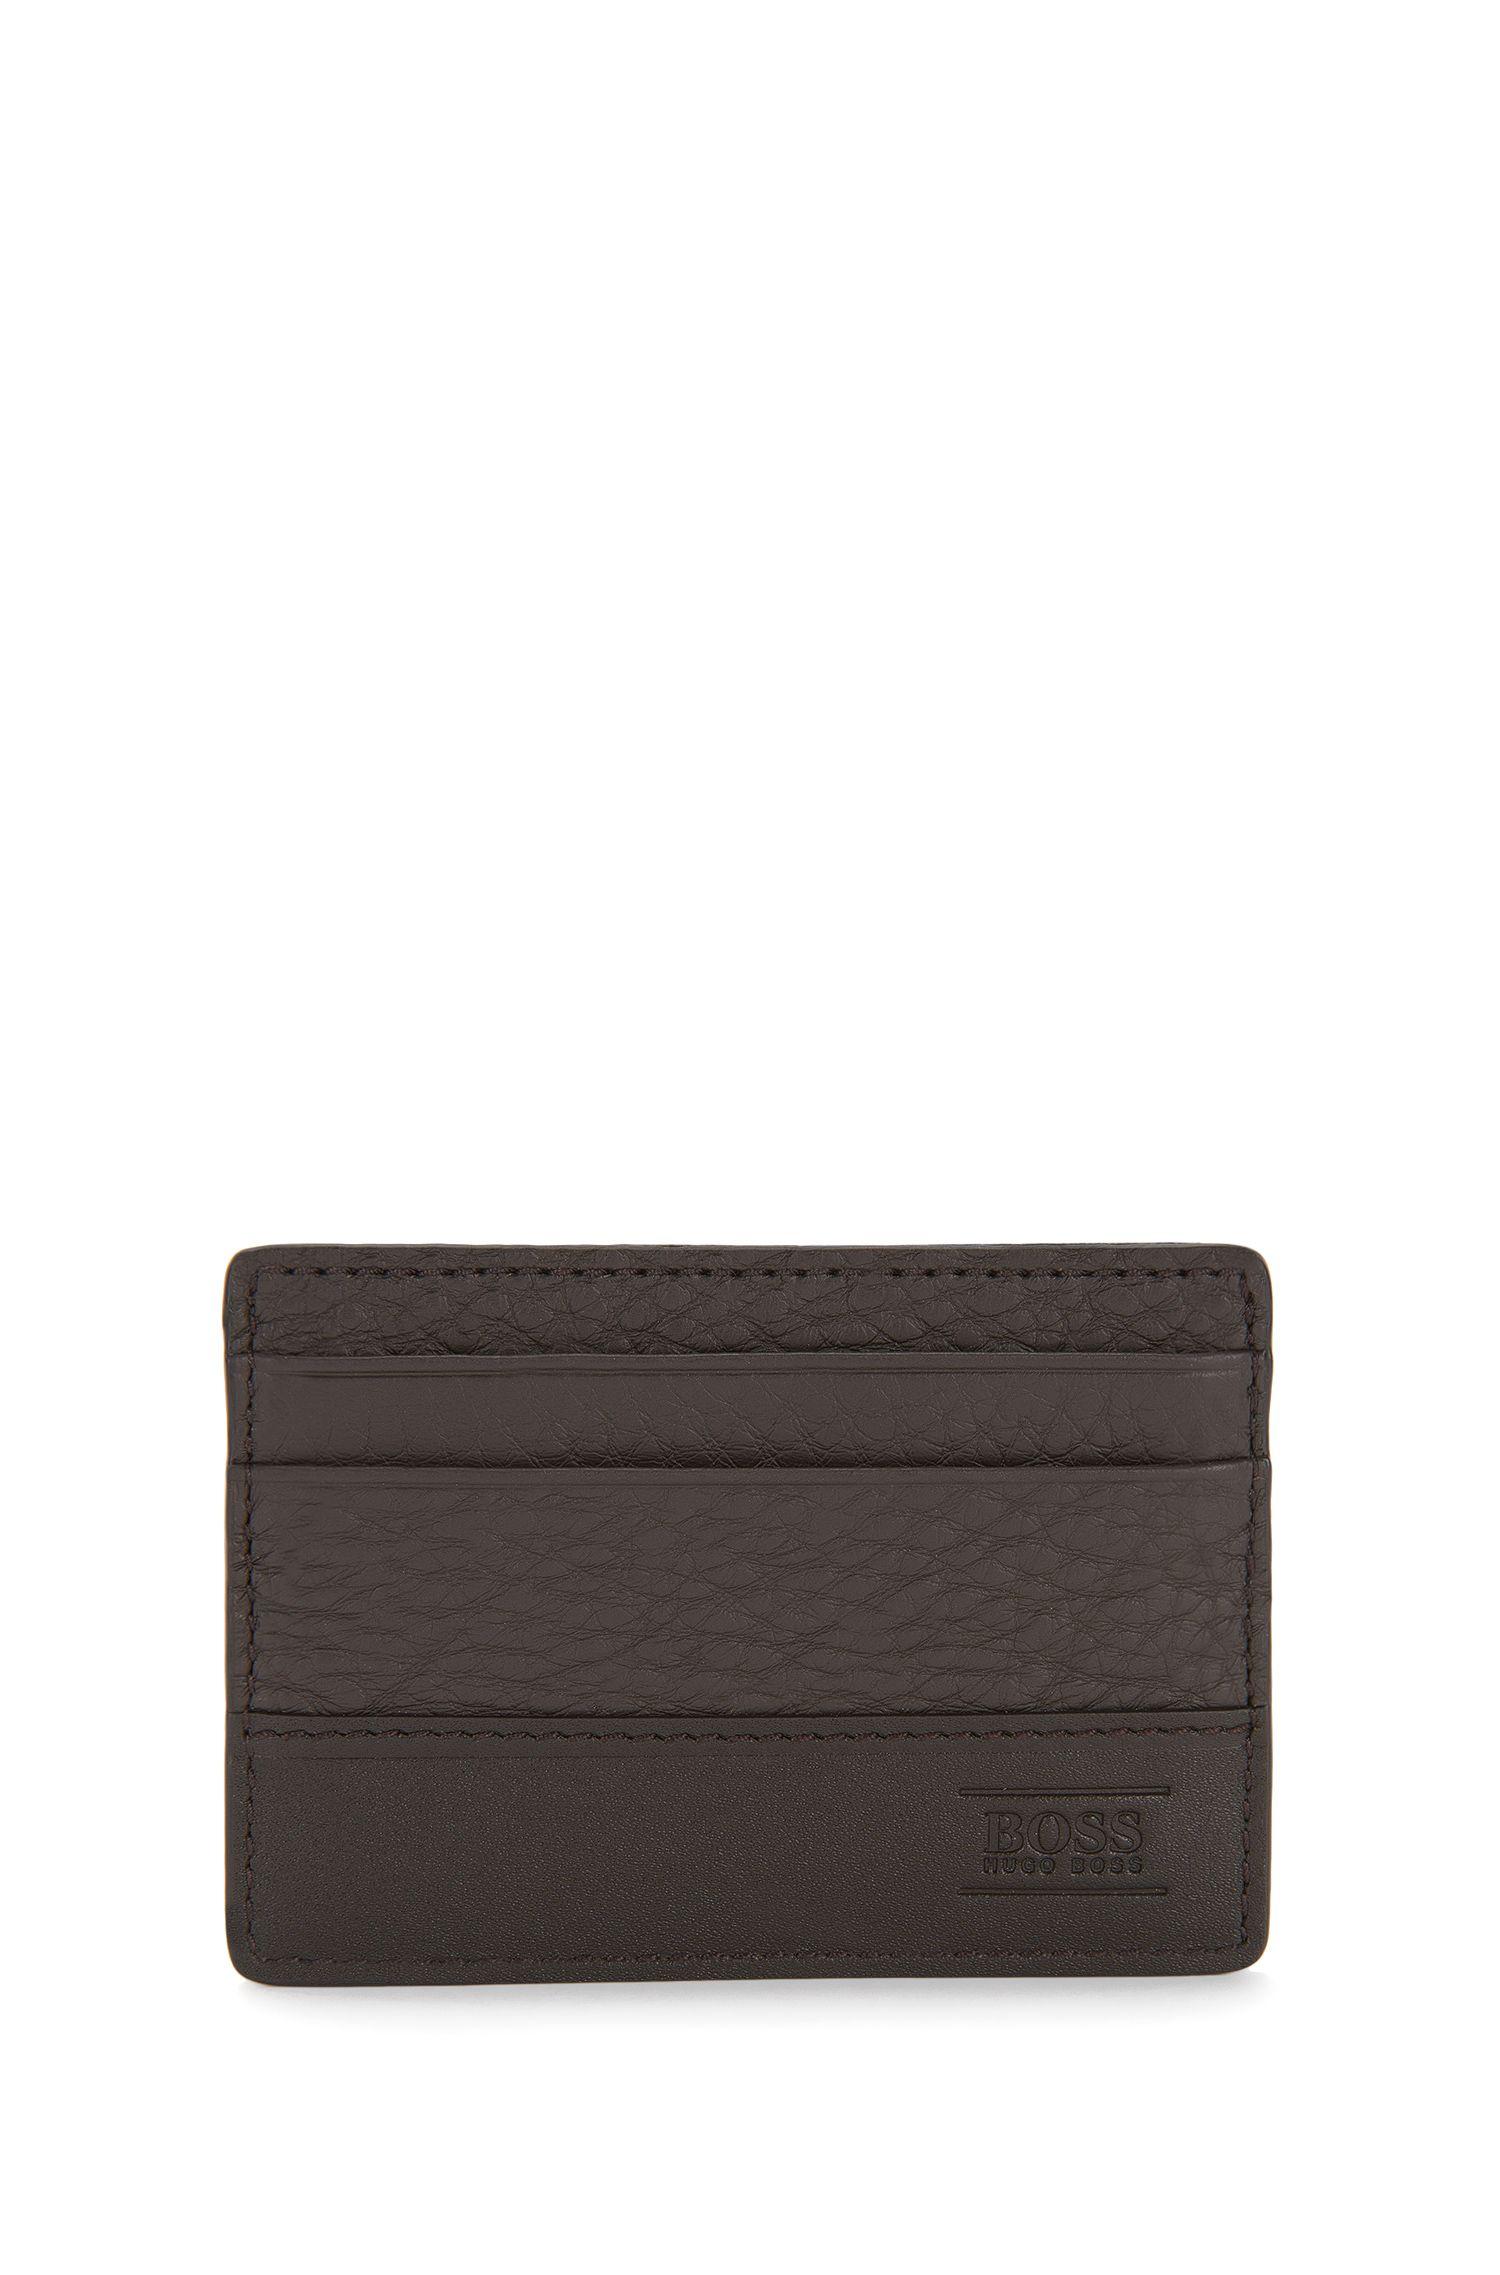 'Aspen S Card' | Leather Card Case